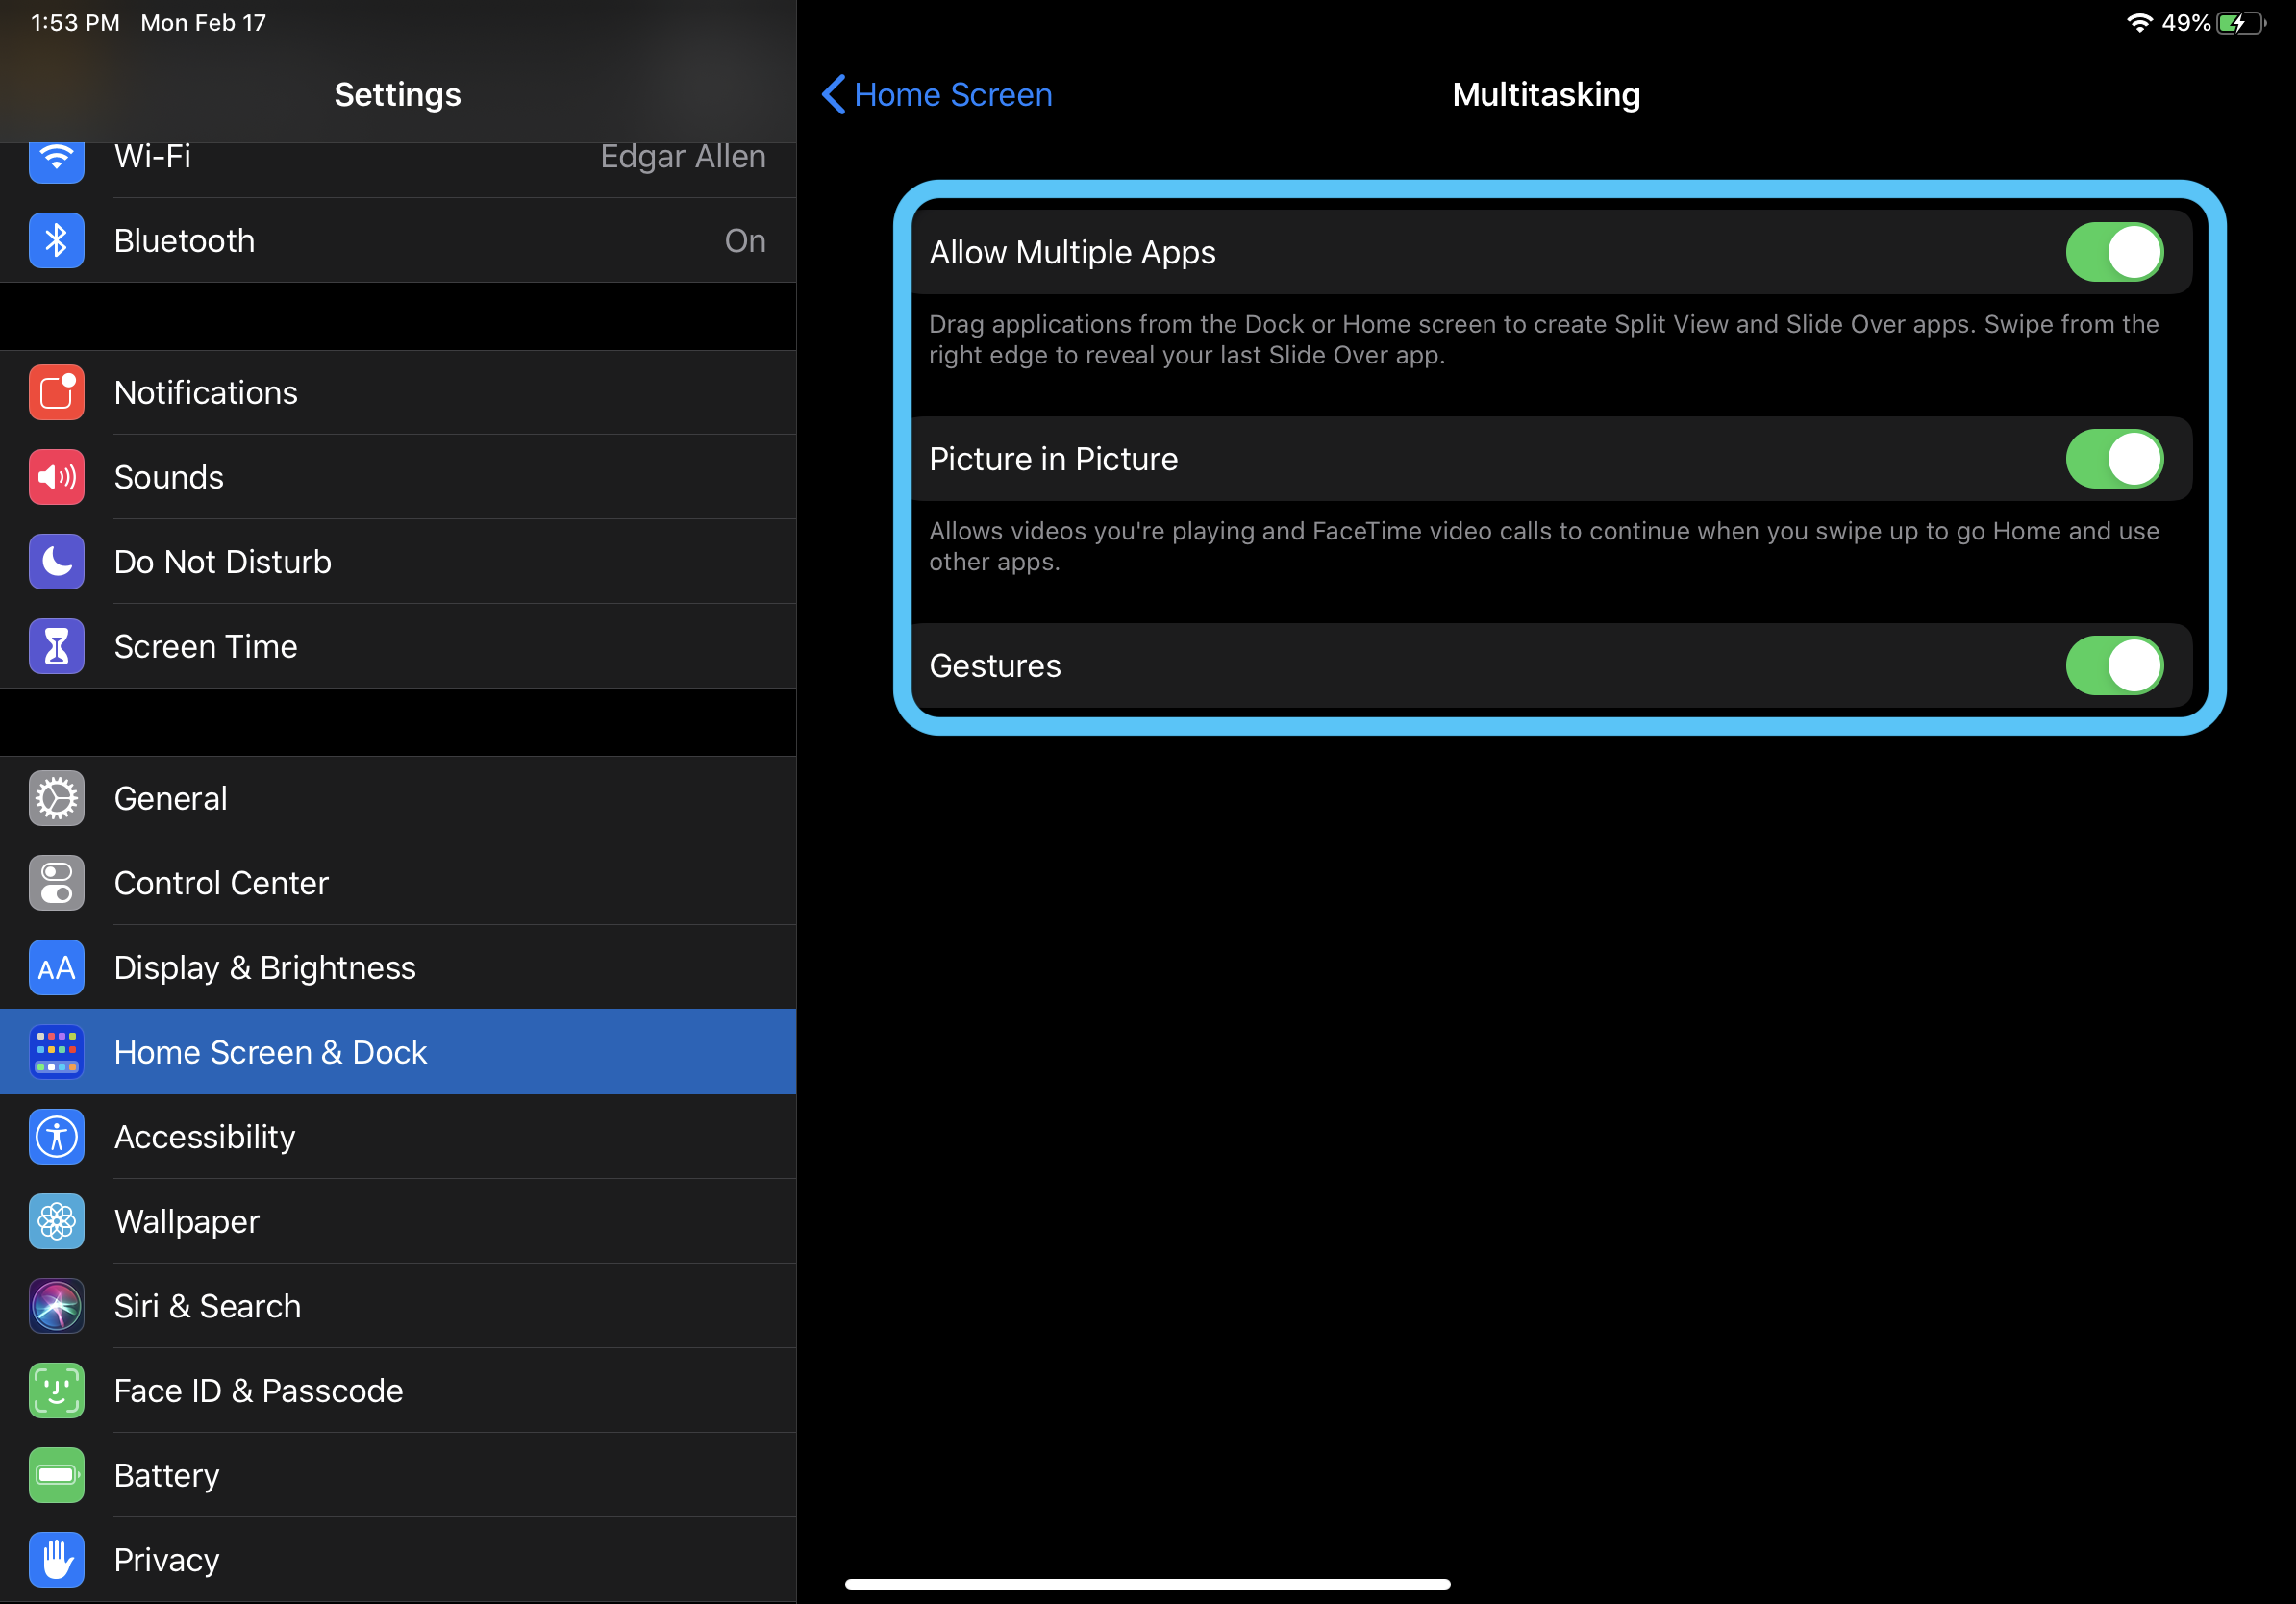 How to turn off iPad multitasking walkthrough 2